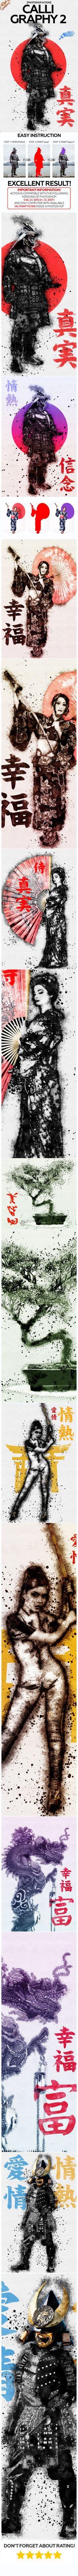 Calligraphy 2 Photoshop Action — #paper art #ink effect #samurai • Download ➝ https://graphicriver.net/item/calligraphy-2-photoshop-action/21210621?ref=pxcr